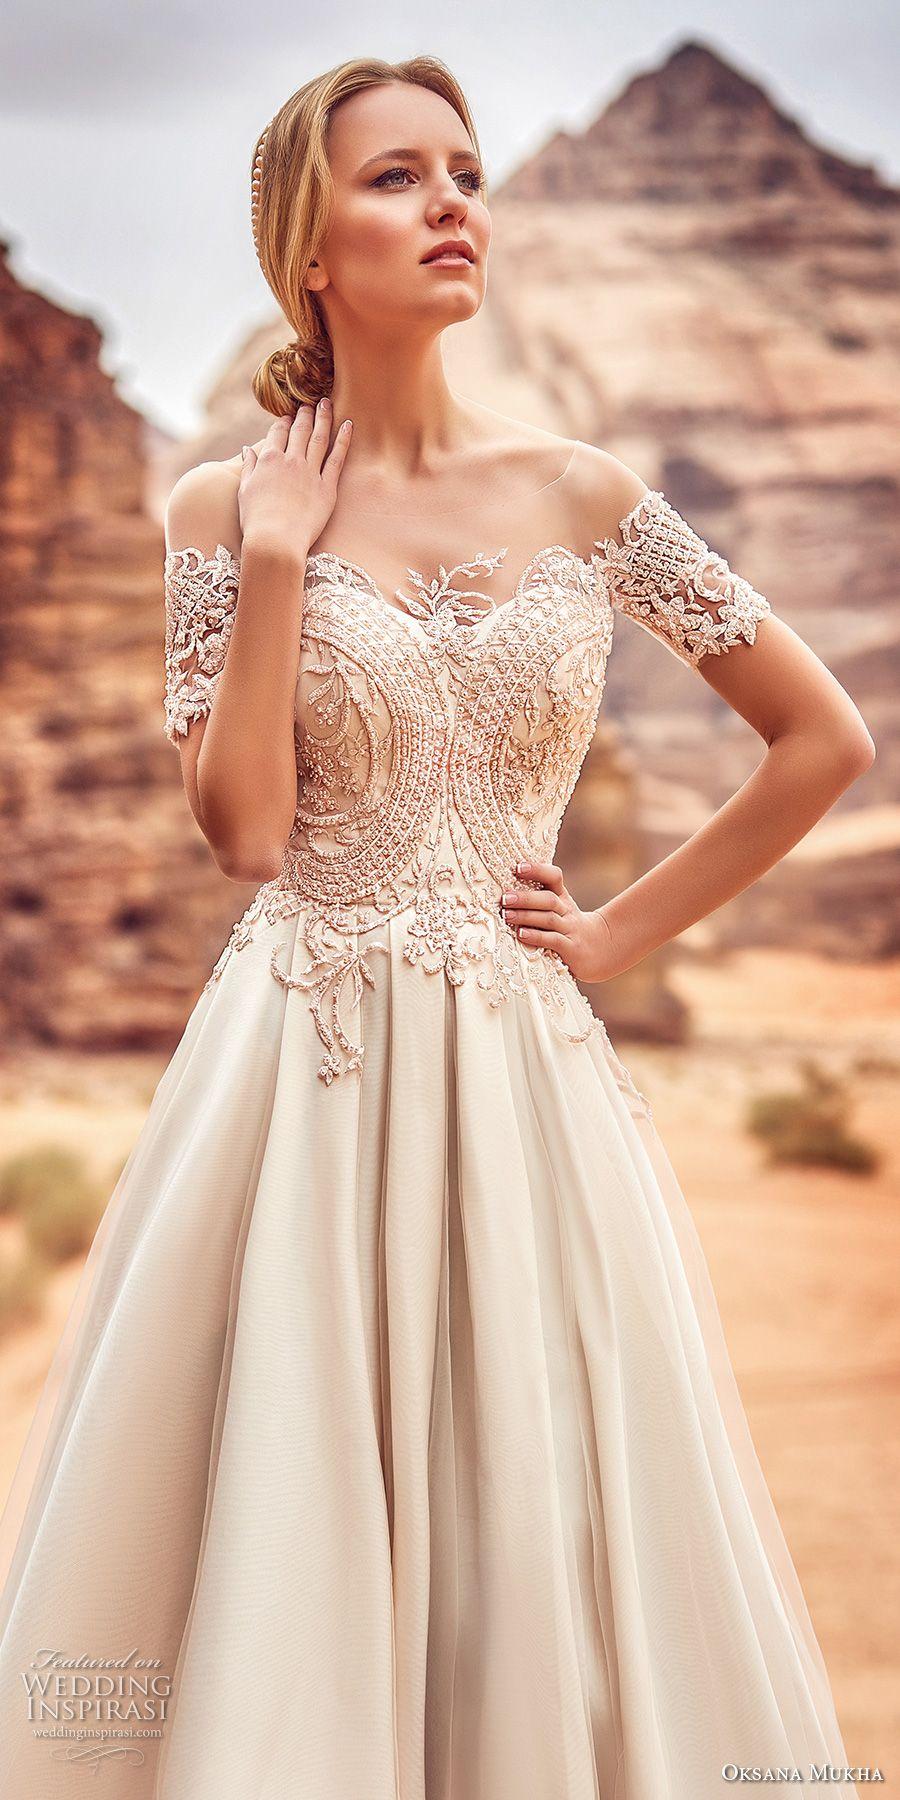 Oksana Mukha 2018 Wedding Dresses Wedding Inspirasi Bridal Dresses Wedding Dresses Lace A Line Wedding Dress